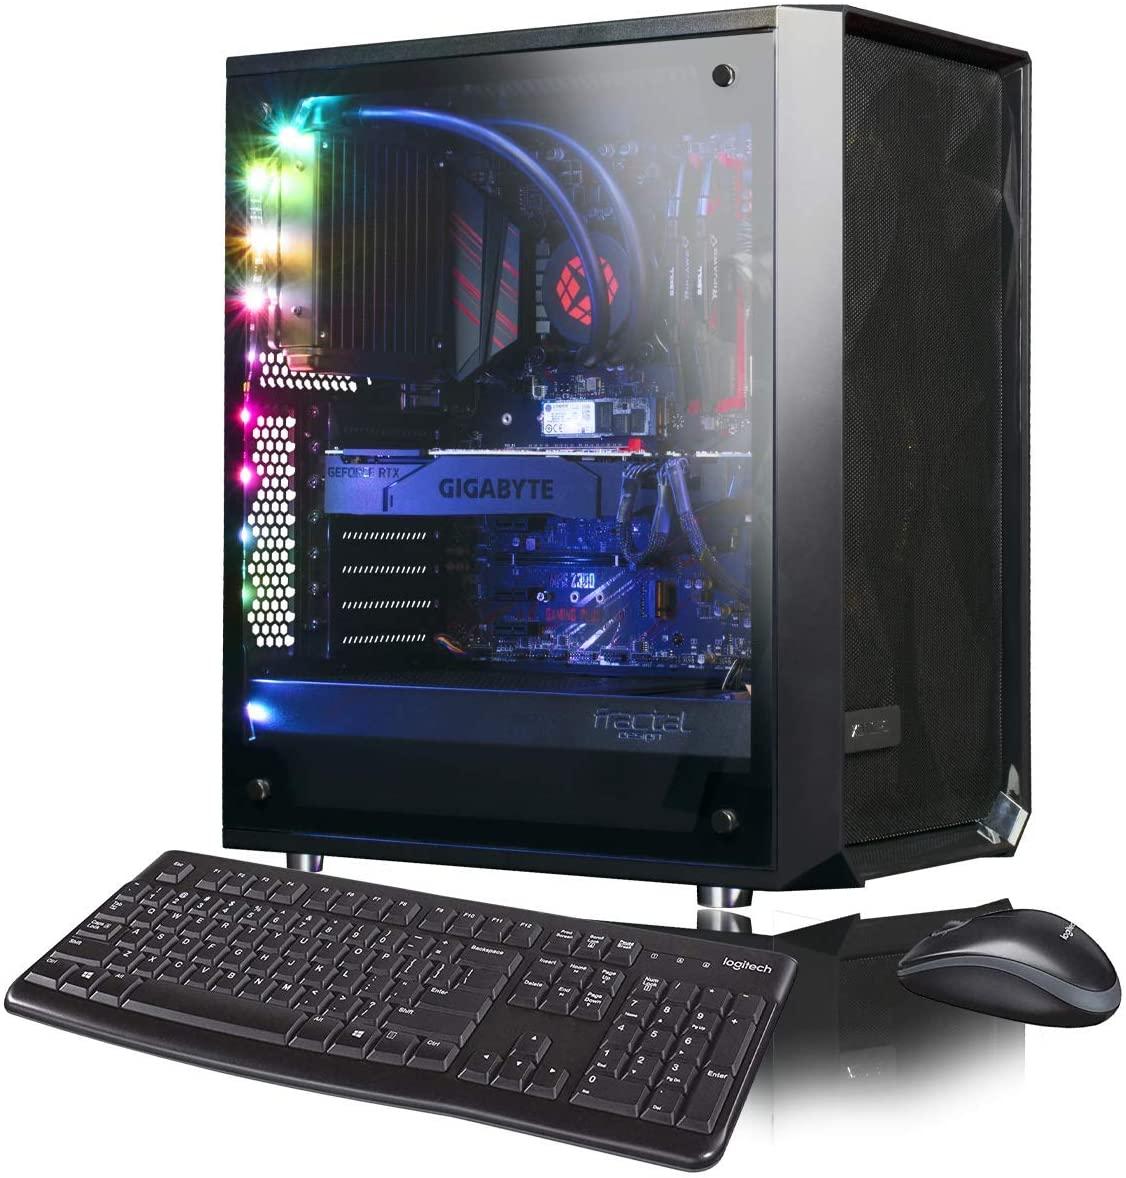 XOTIC Meshify C (Intel 9th Gen i5-9600K 6-core 4.6GHz Turbo, 32GB DDR4 RAM, 500GB NVMe SSD + 2TB HDD, GTX 1660 6GB, Windows 10) Liquid Cooled Gaming Desktop PC